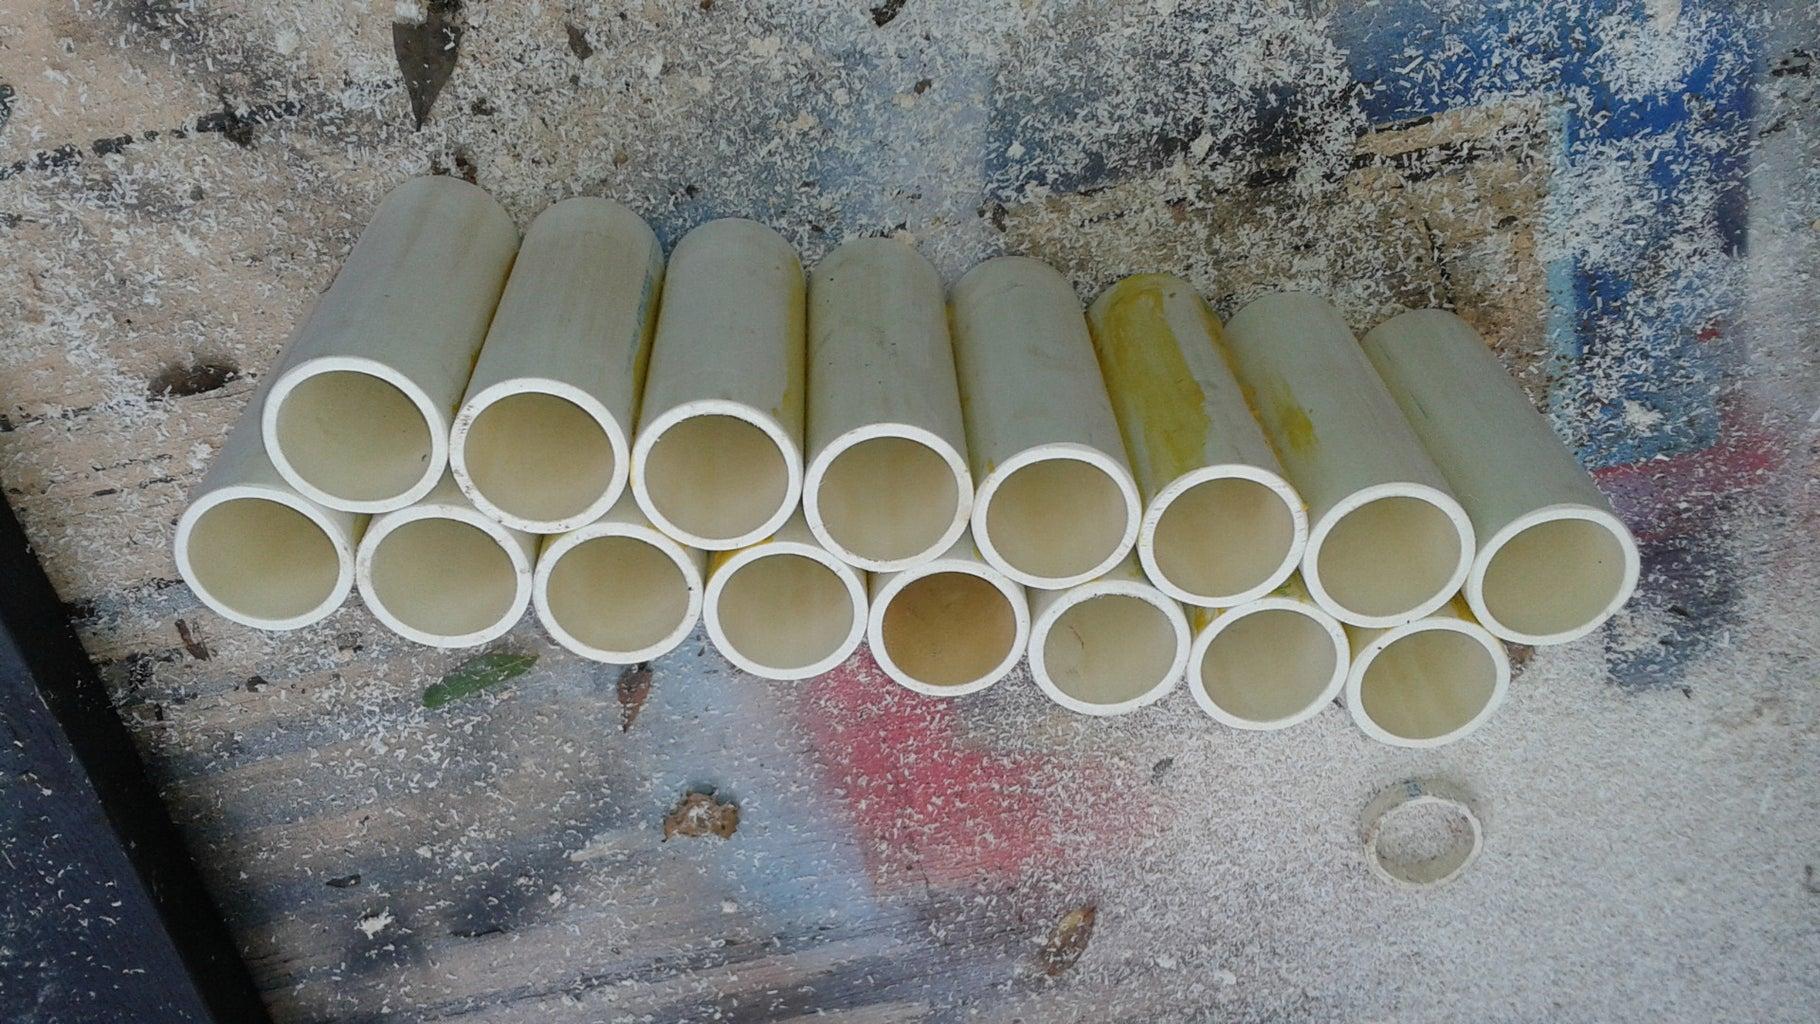 Glueing the PVC